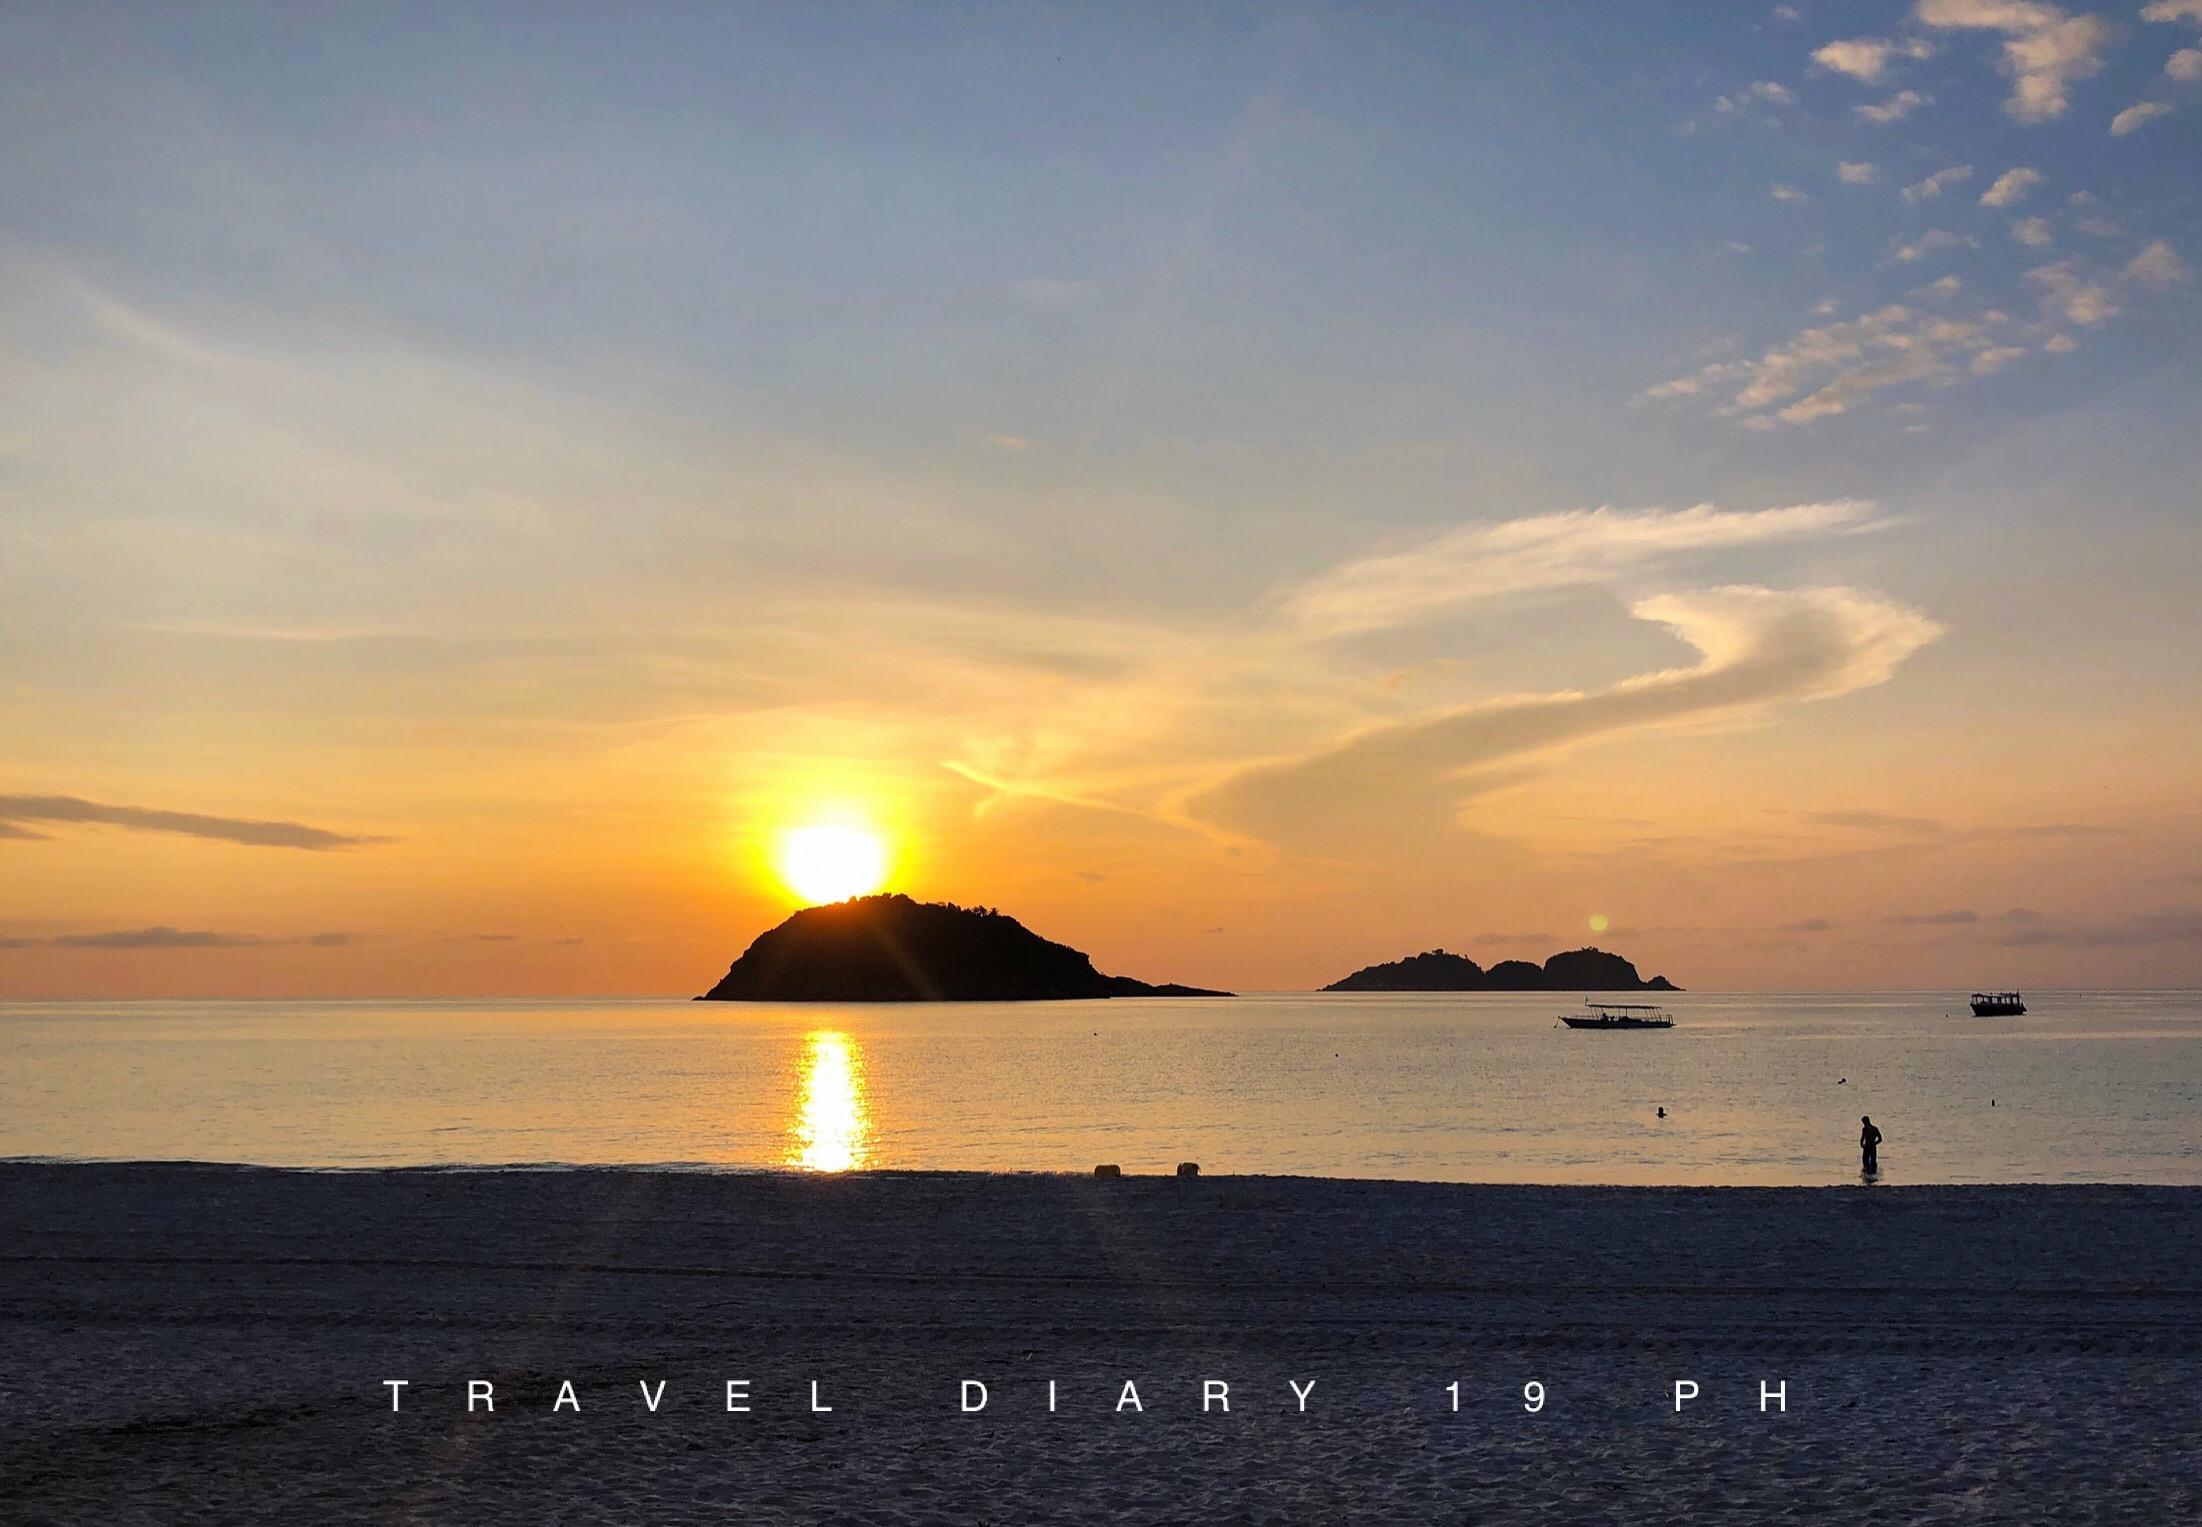 Tramonto a long beach sull isola di Redang in Malesia